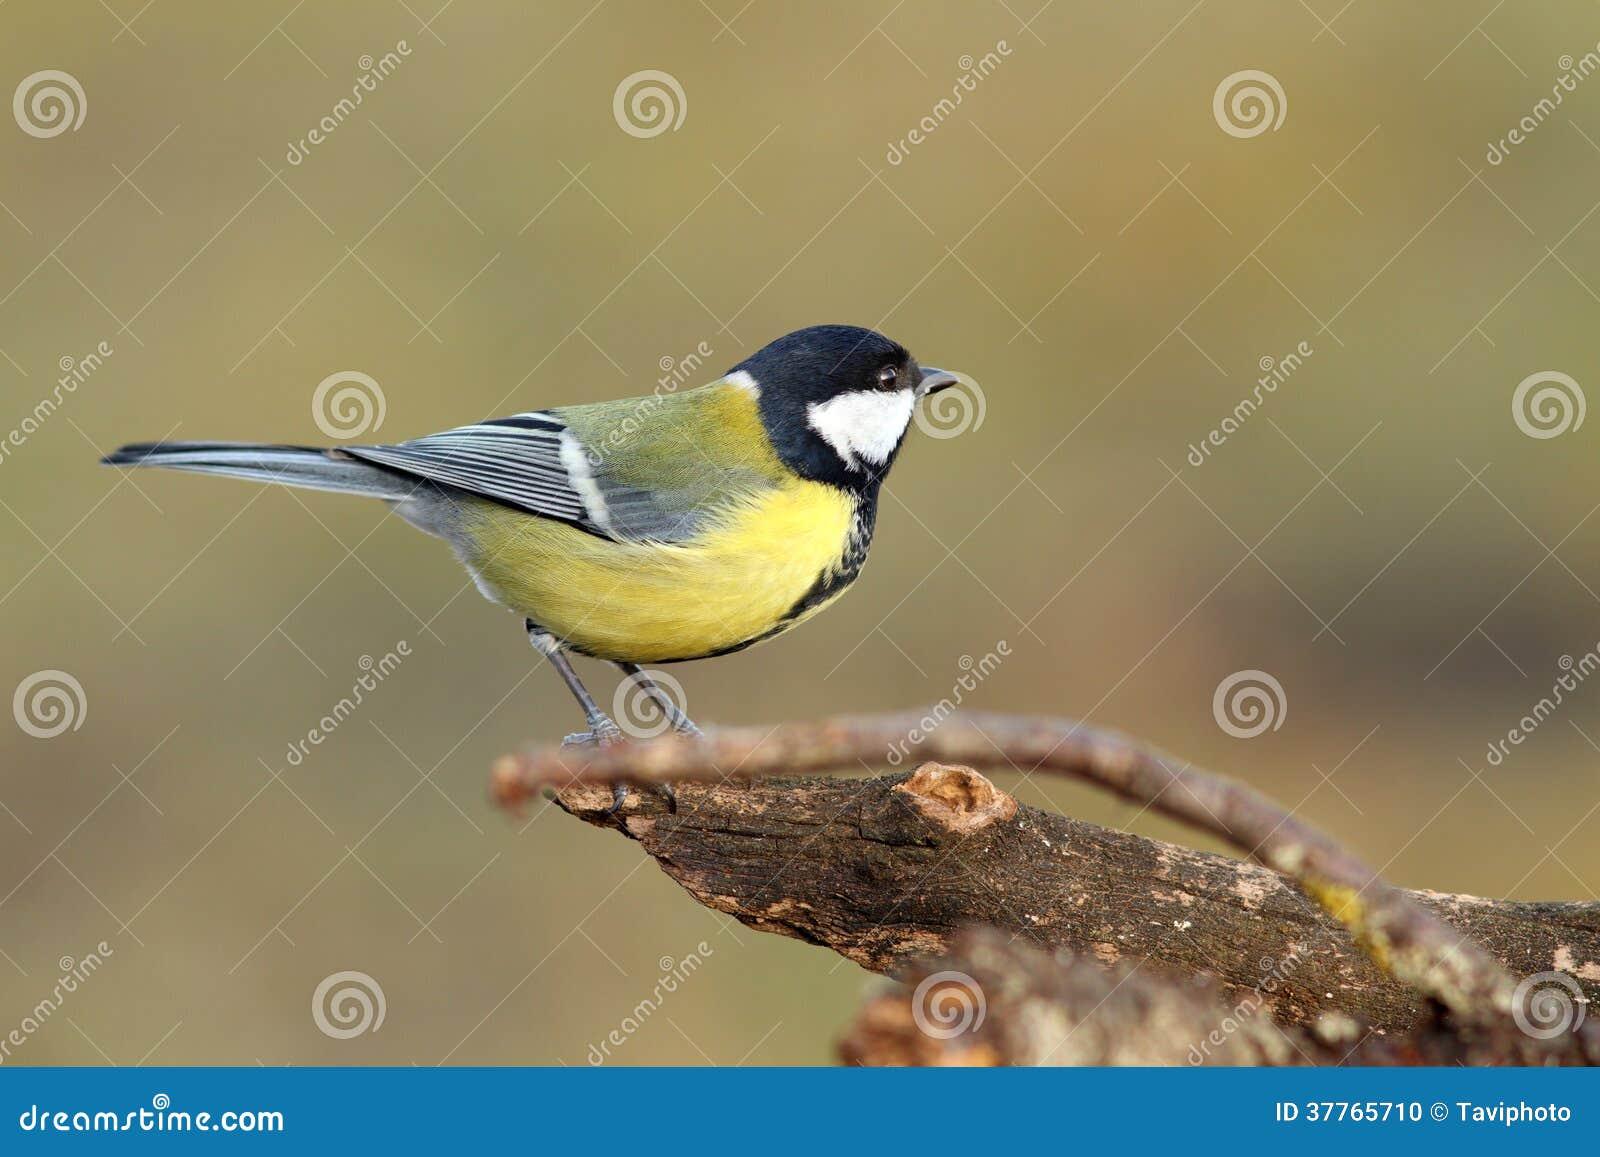 Bel oiseau minuscule dans le jardin photo stock image for Oiseau decoratif jardin